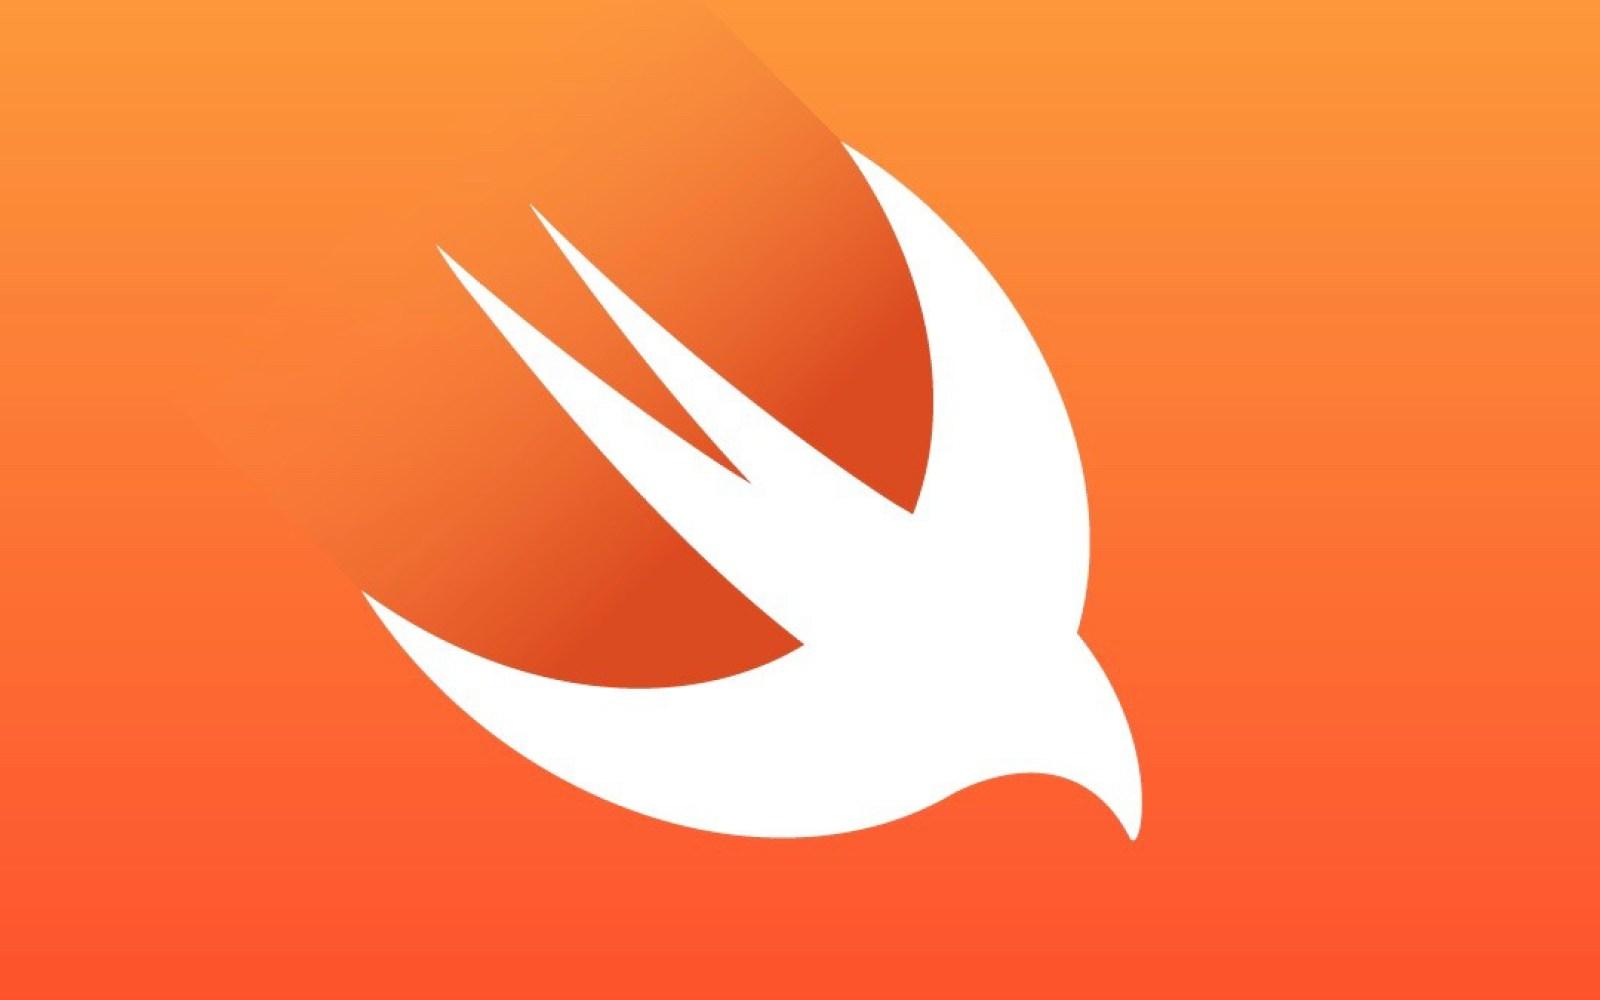 IBM announces next implementation of Apple's Swift developer language